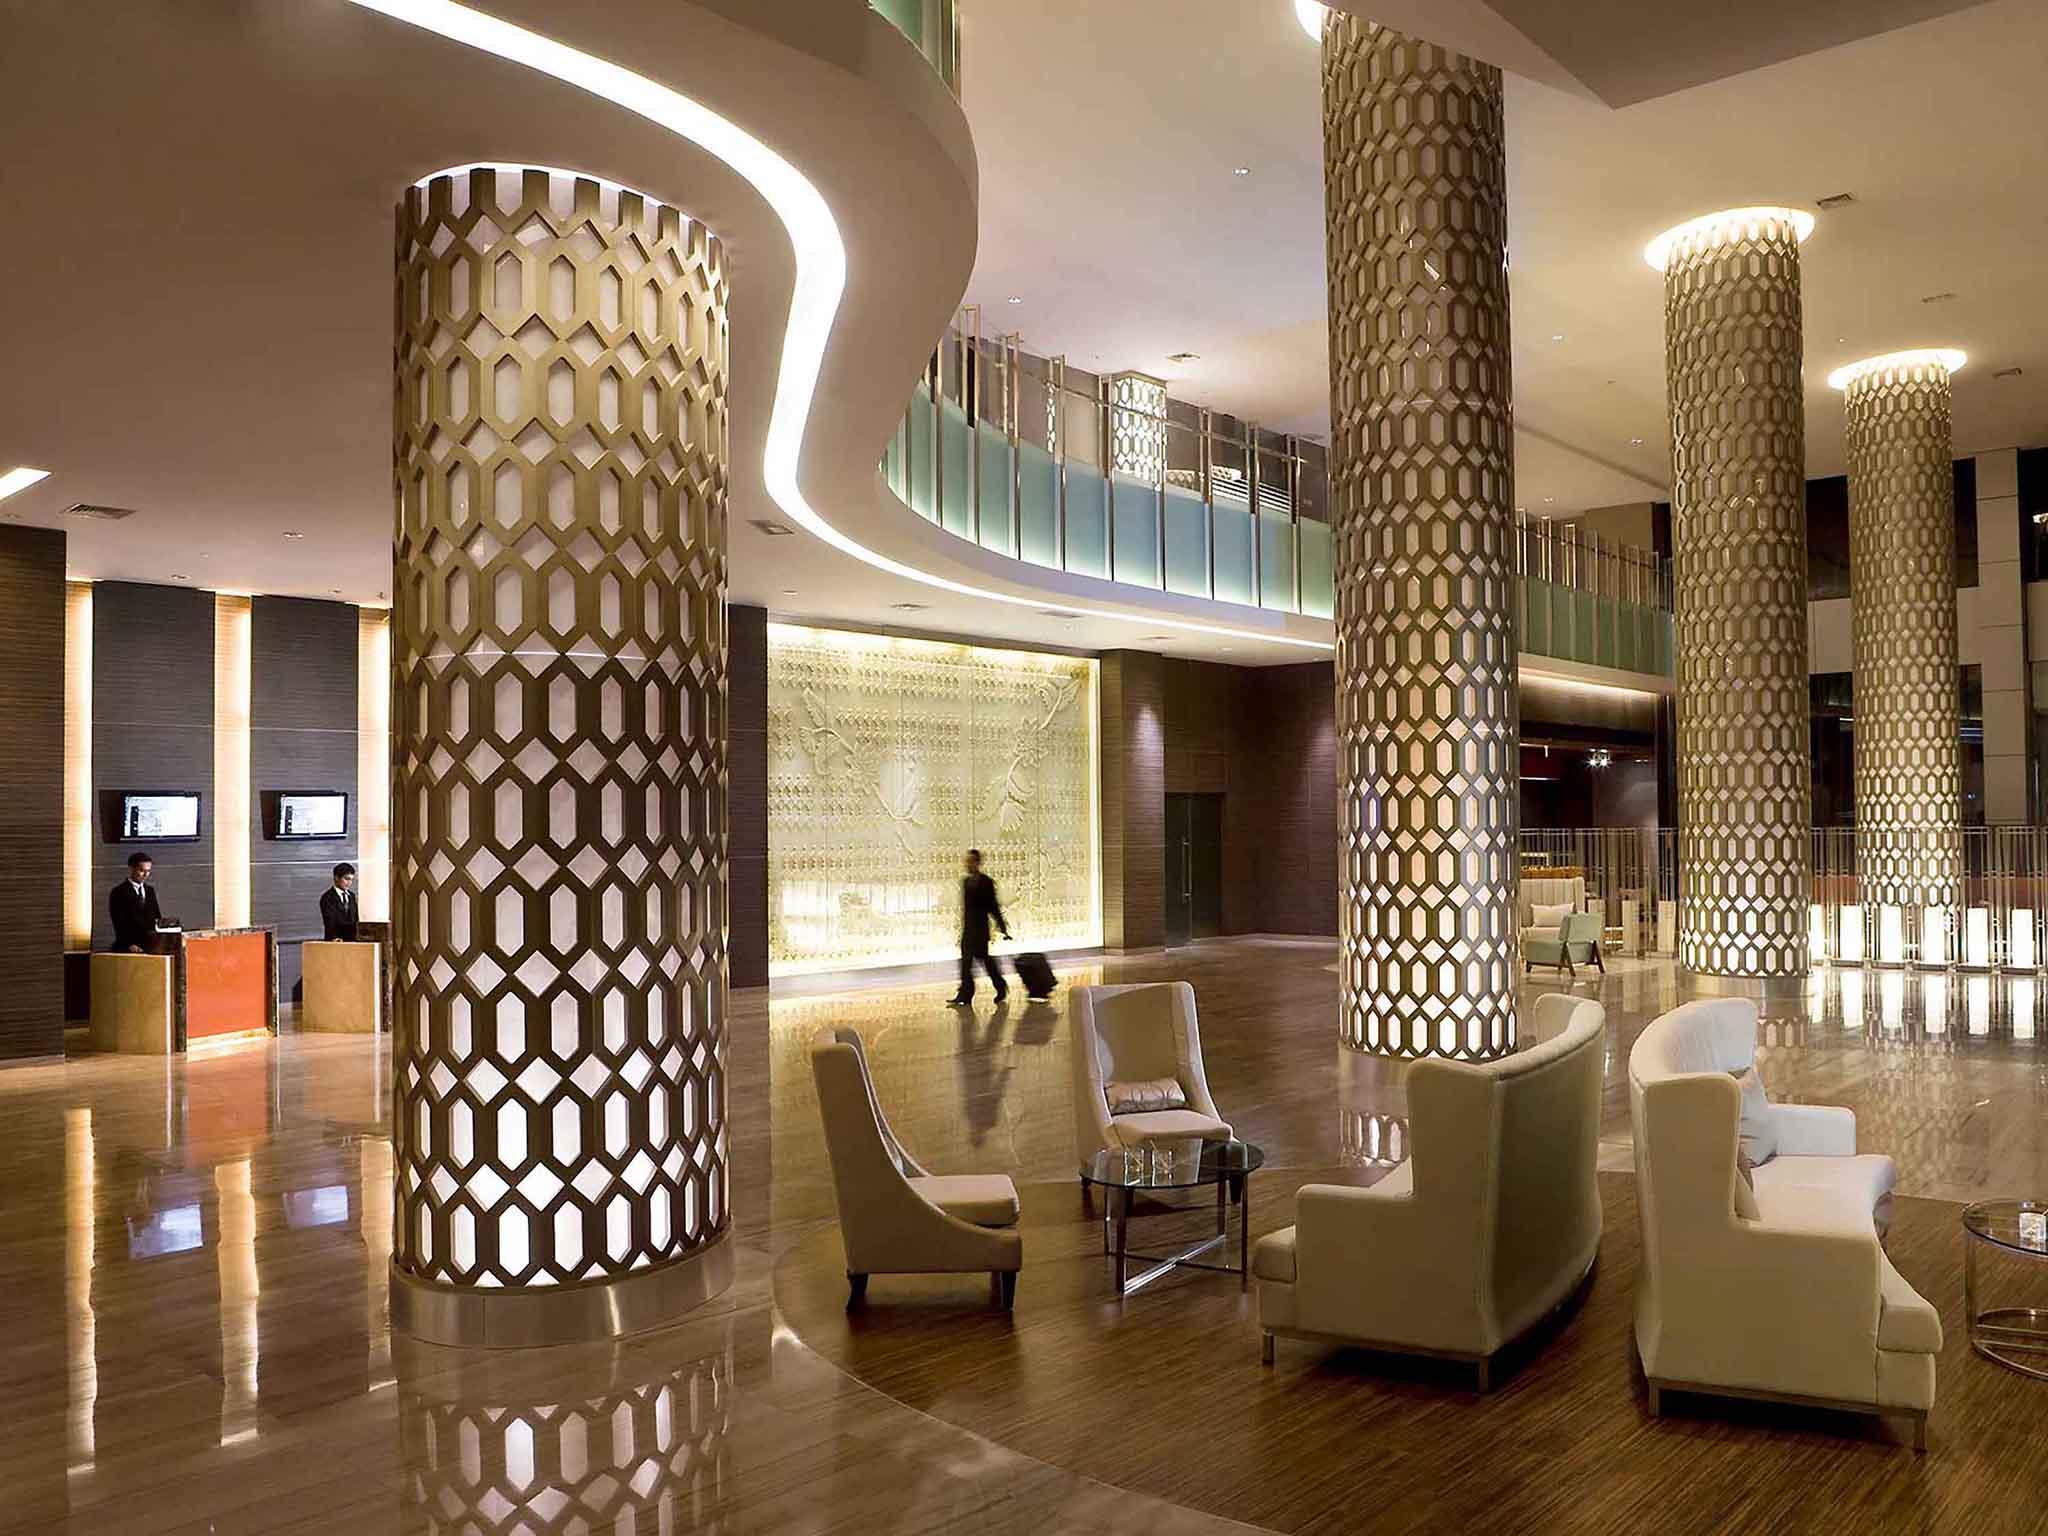 Hotel - Novotel Bangka - Hotel & Convention Centre